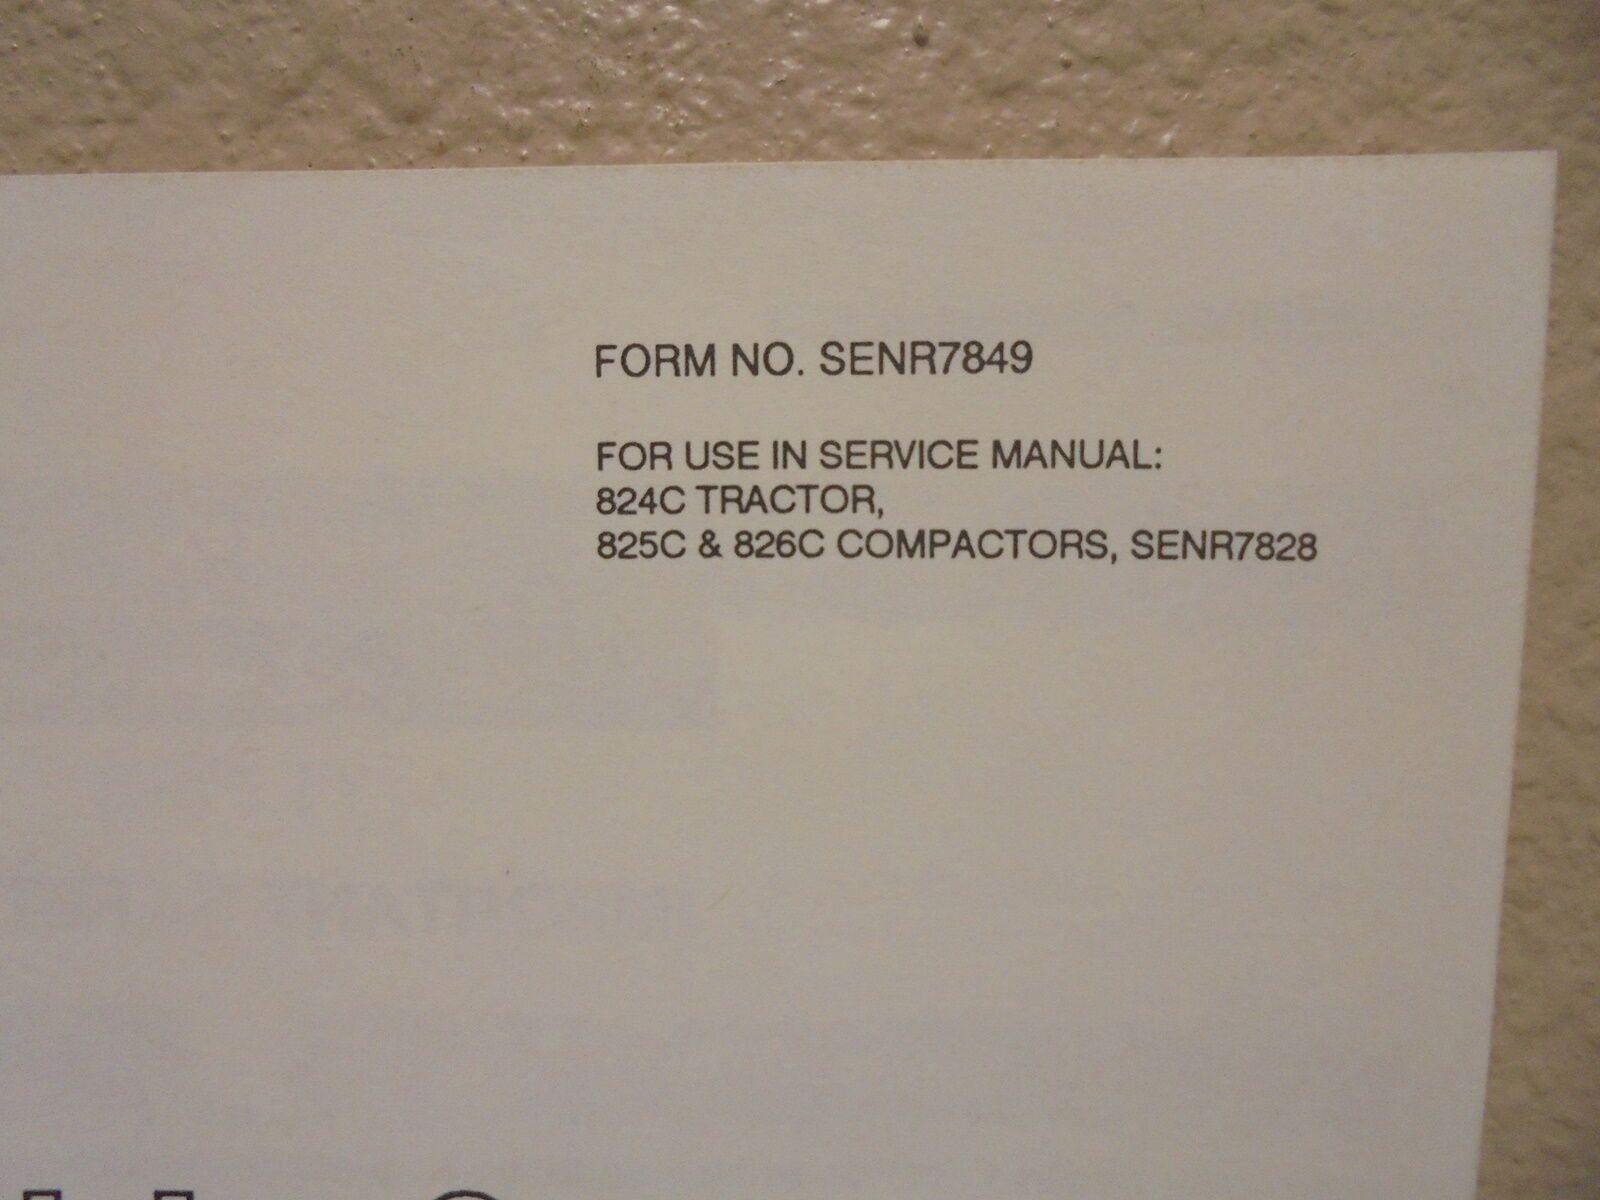 Tractor De Oruga 824C 825C 826C manual de de de montaje Compactador dissassembly 11c747